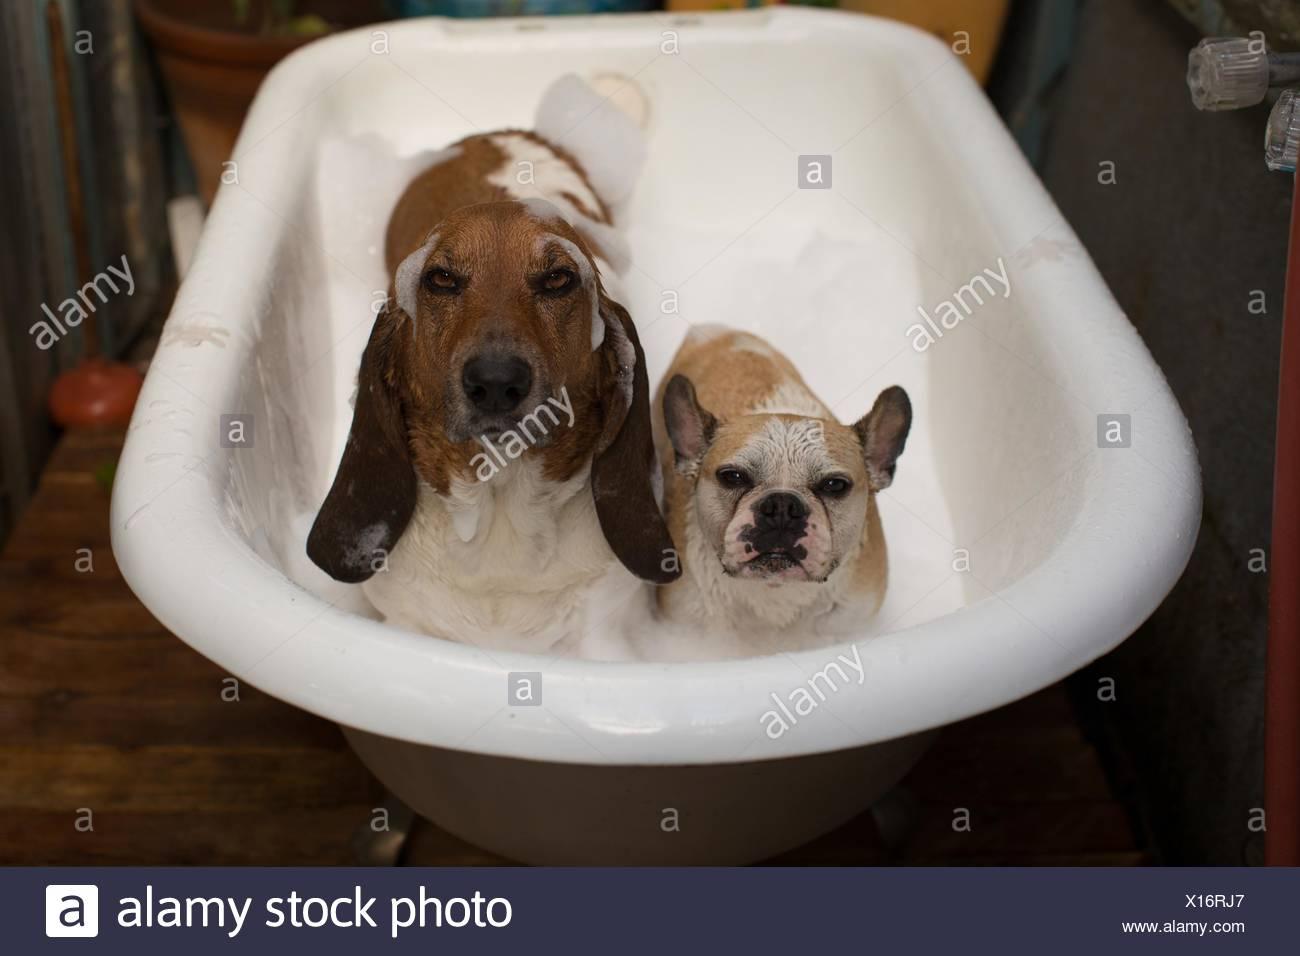 Vasca Da Bagno In Francese : Basset hound e bulldog francese nella vasca da bagno rivestito in